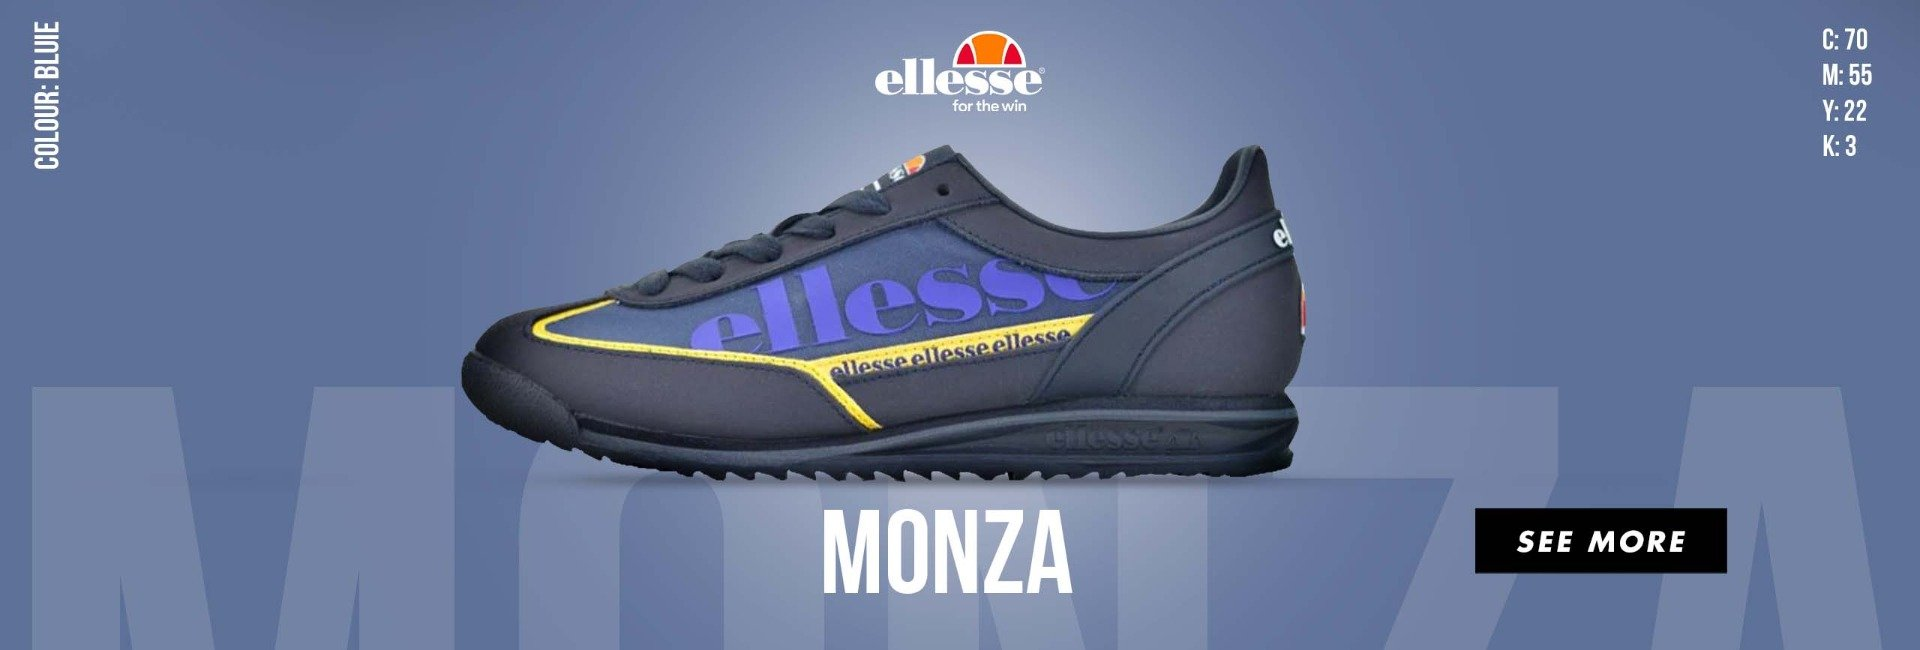 ellesse Monza 2